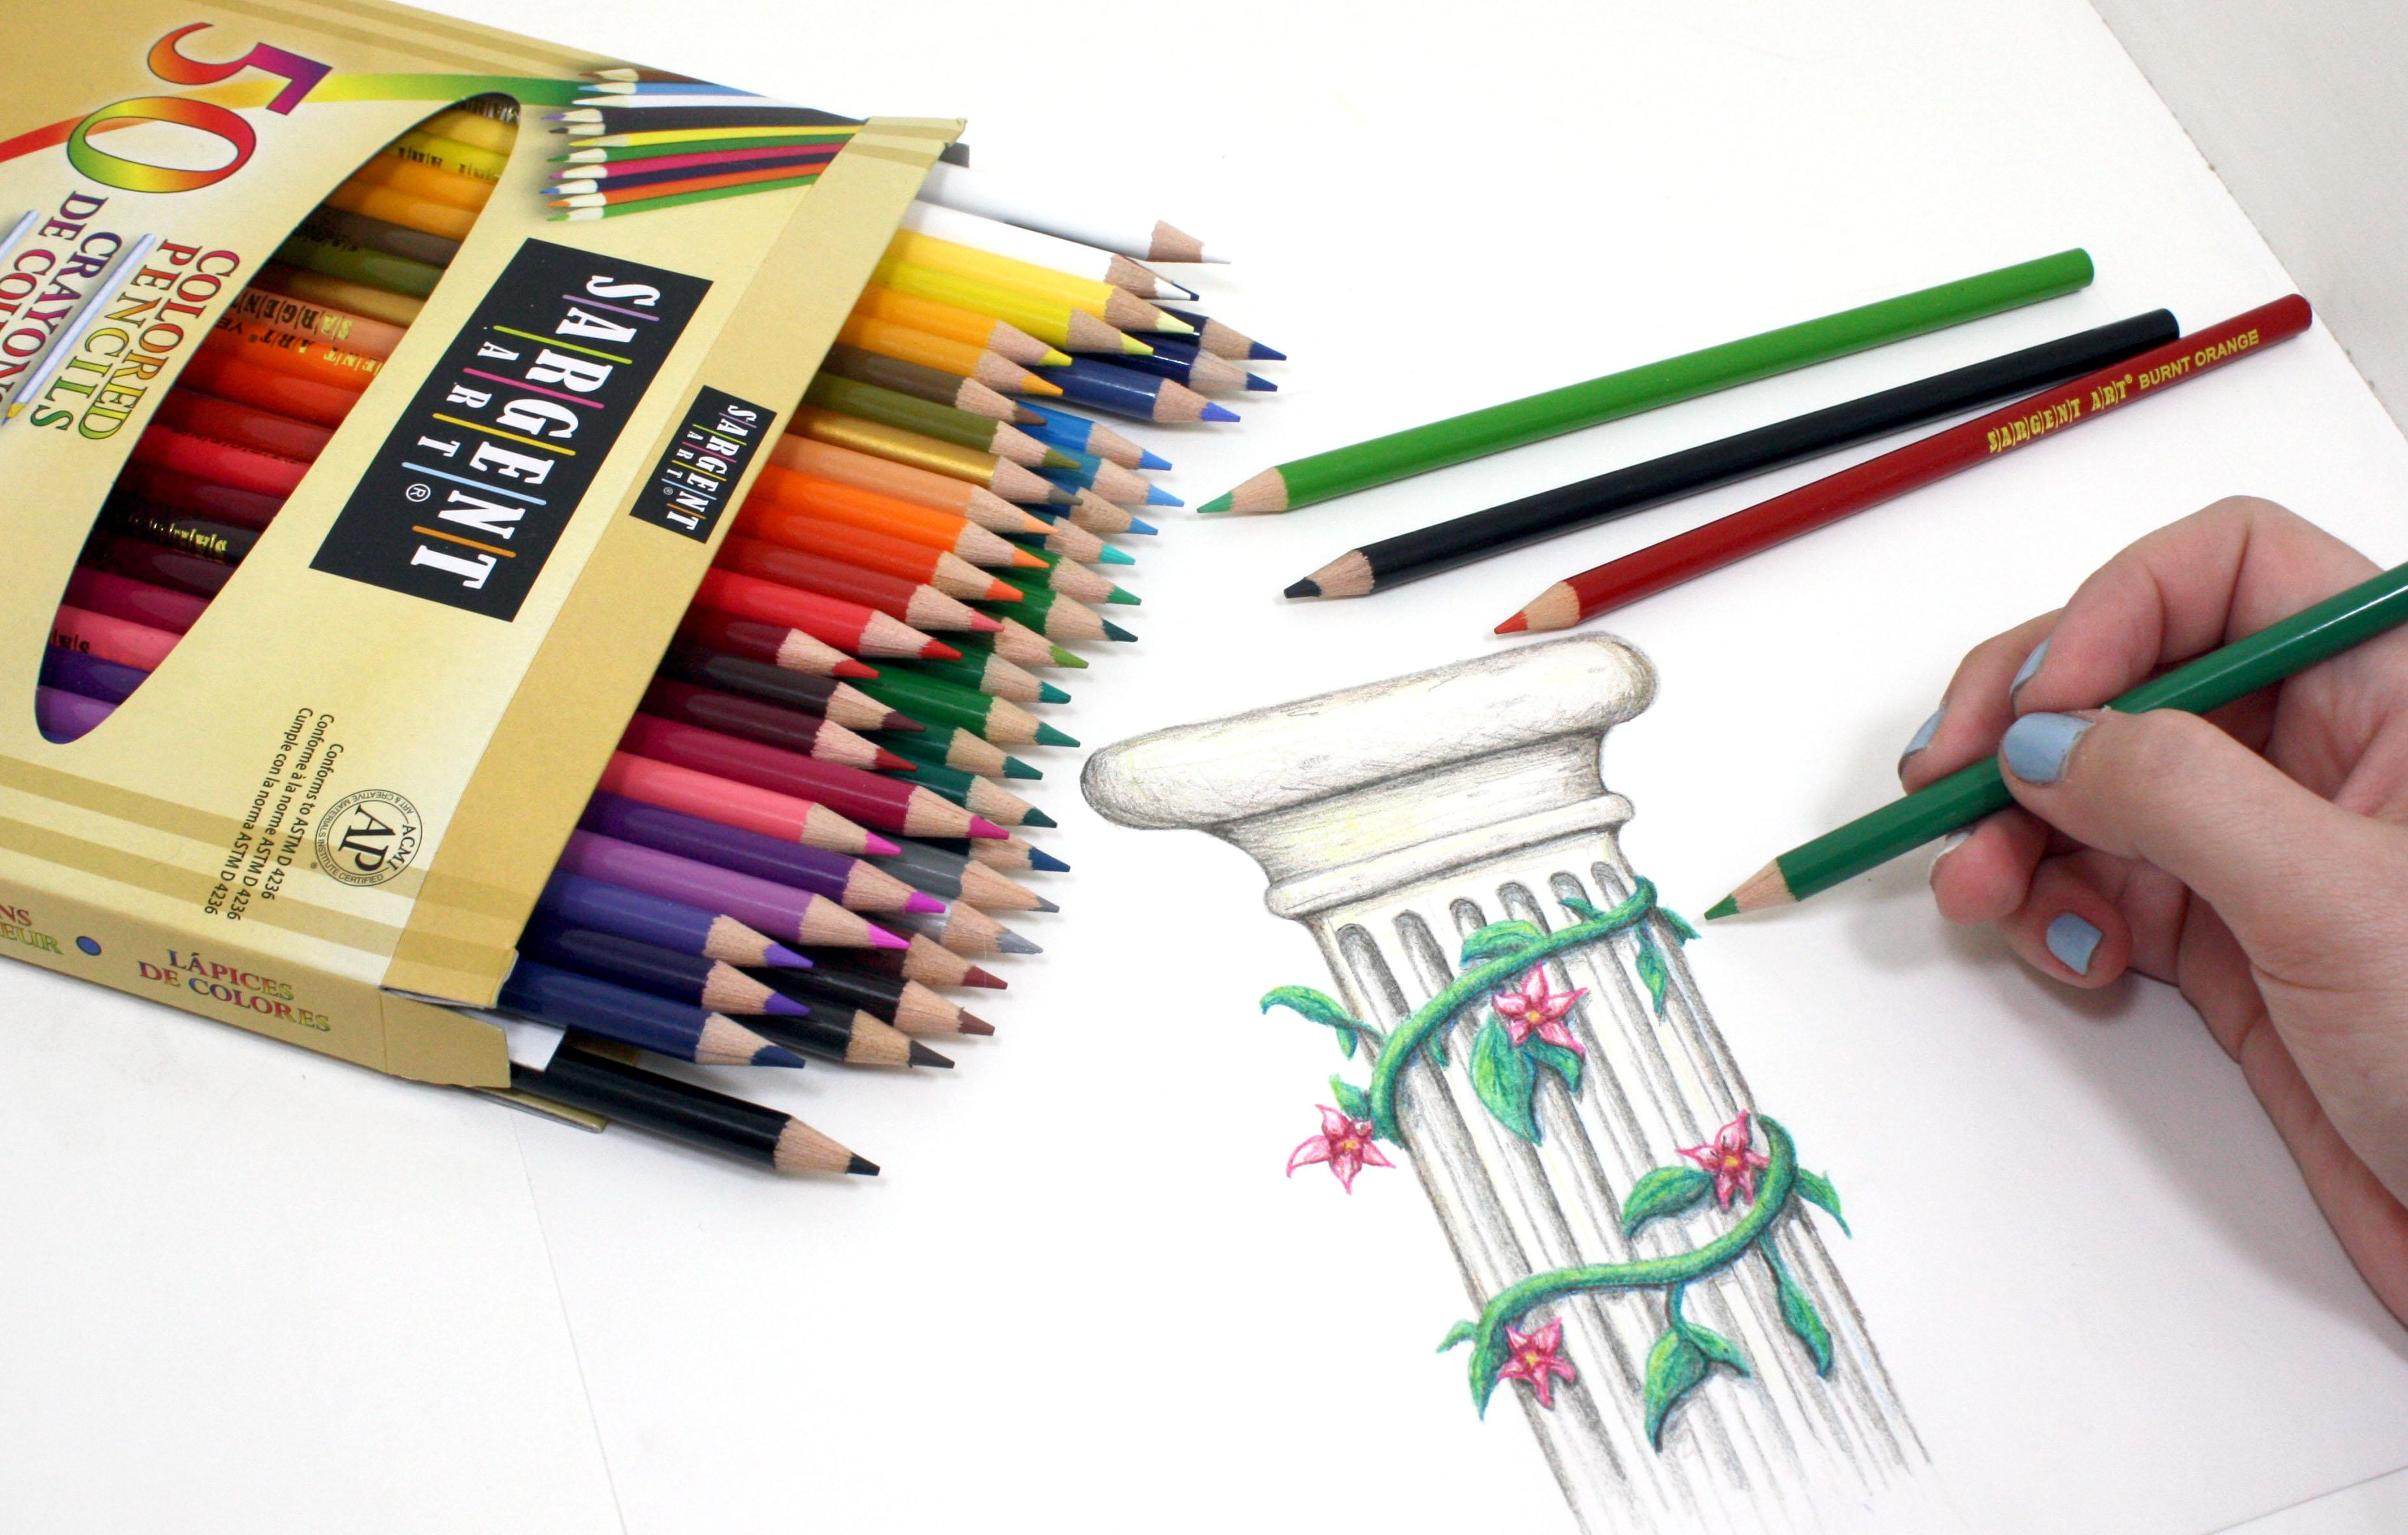 sargent art 22 7251 colored pencils pack of 50 assorted colors accessory arts. Black Bedroom Furniture Sets. Home Design Ideas